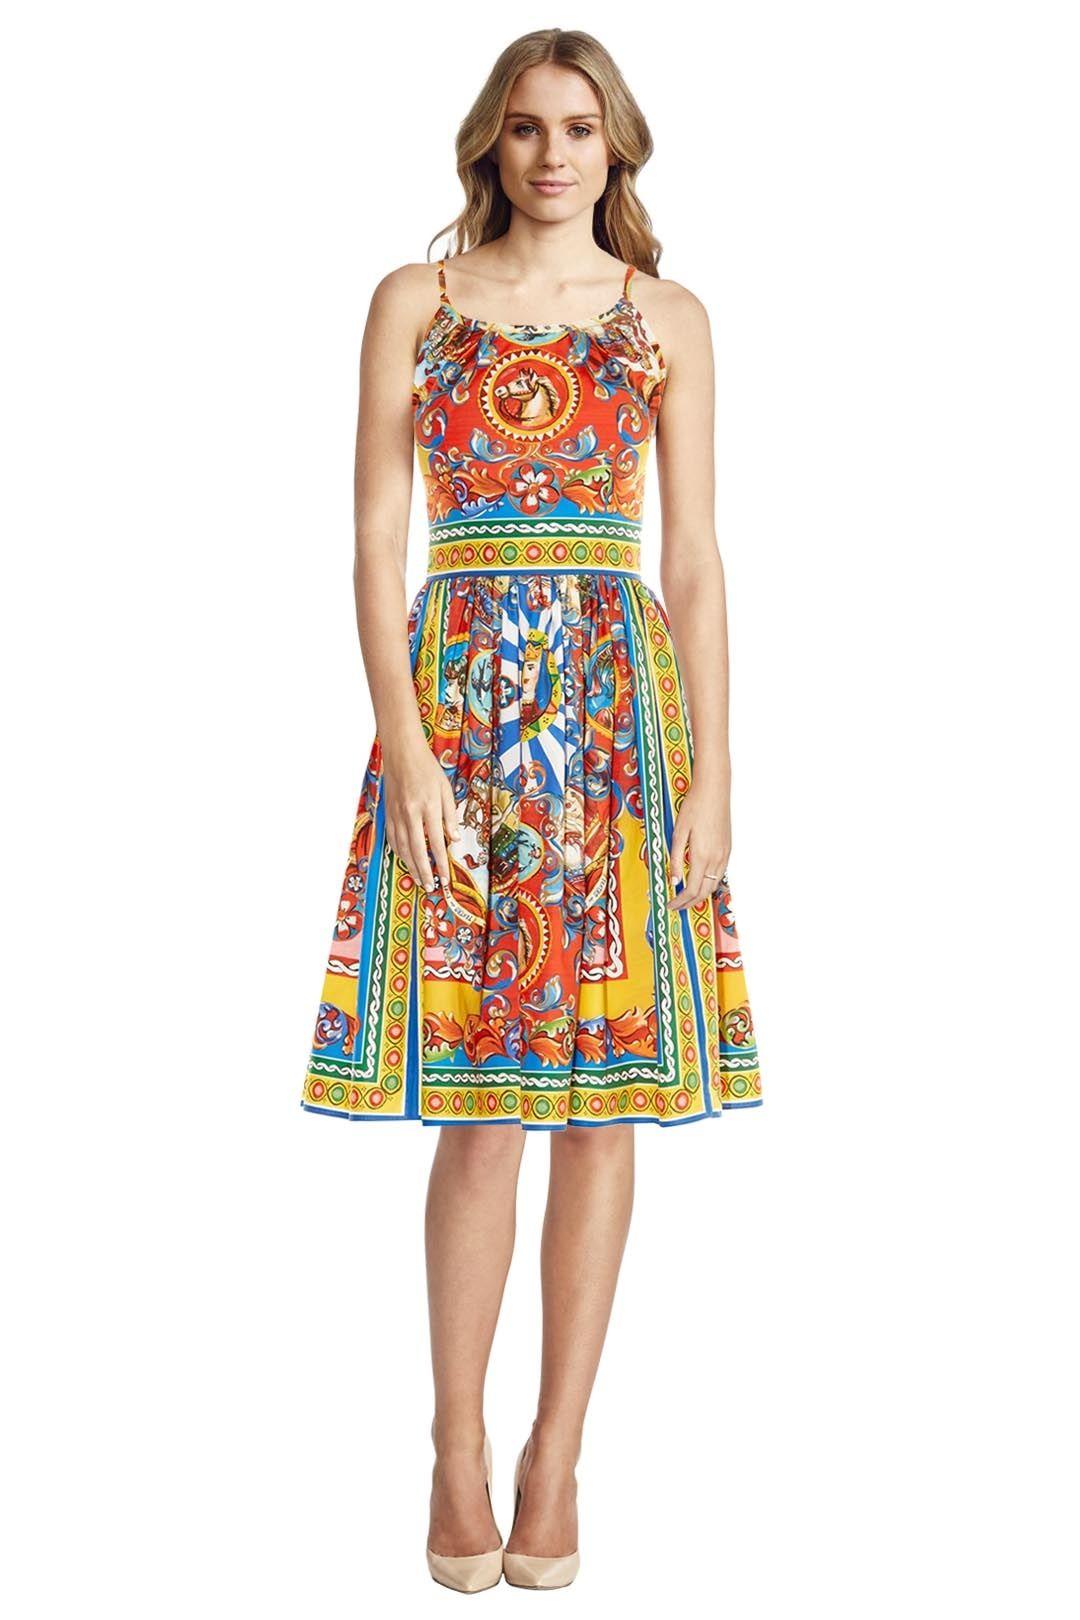 Dolce & Gabbana - Carretto Print Sleeveless Dress - Prints - Front